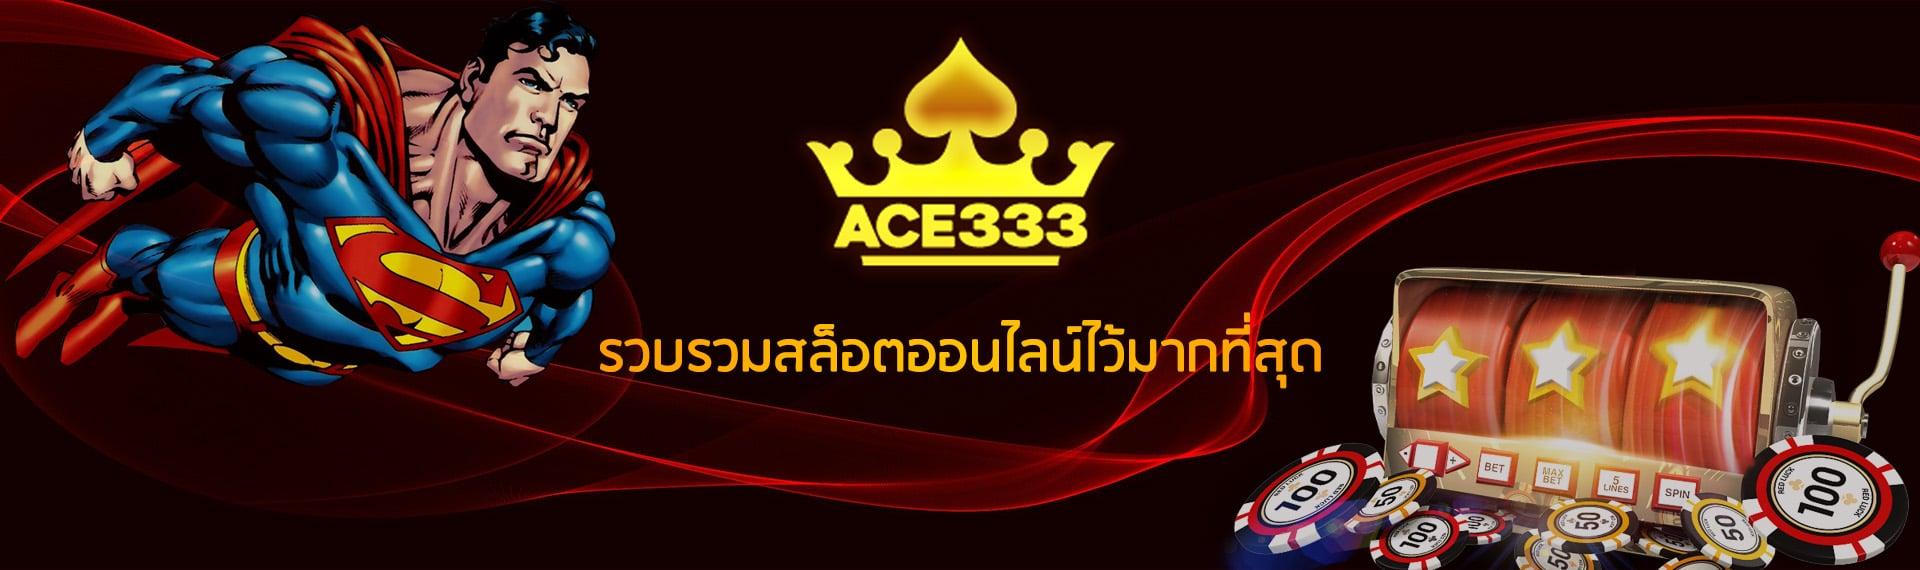 Ace333 ไทย3